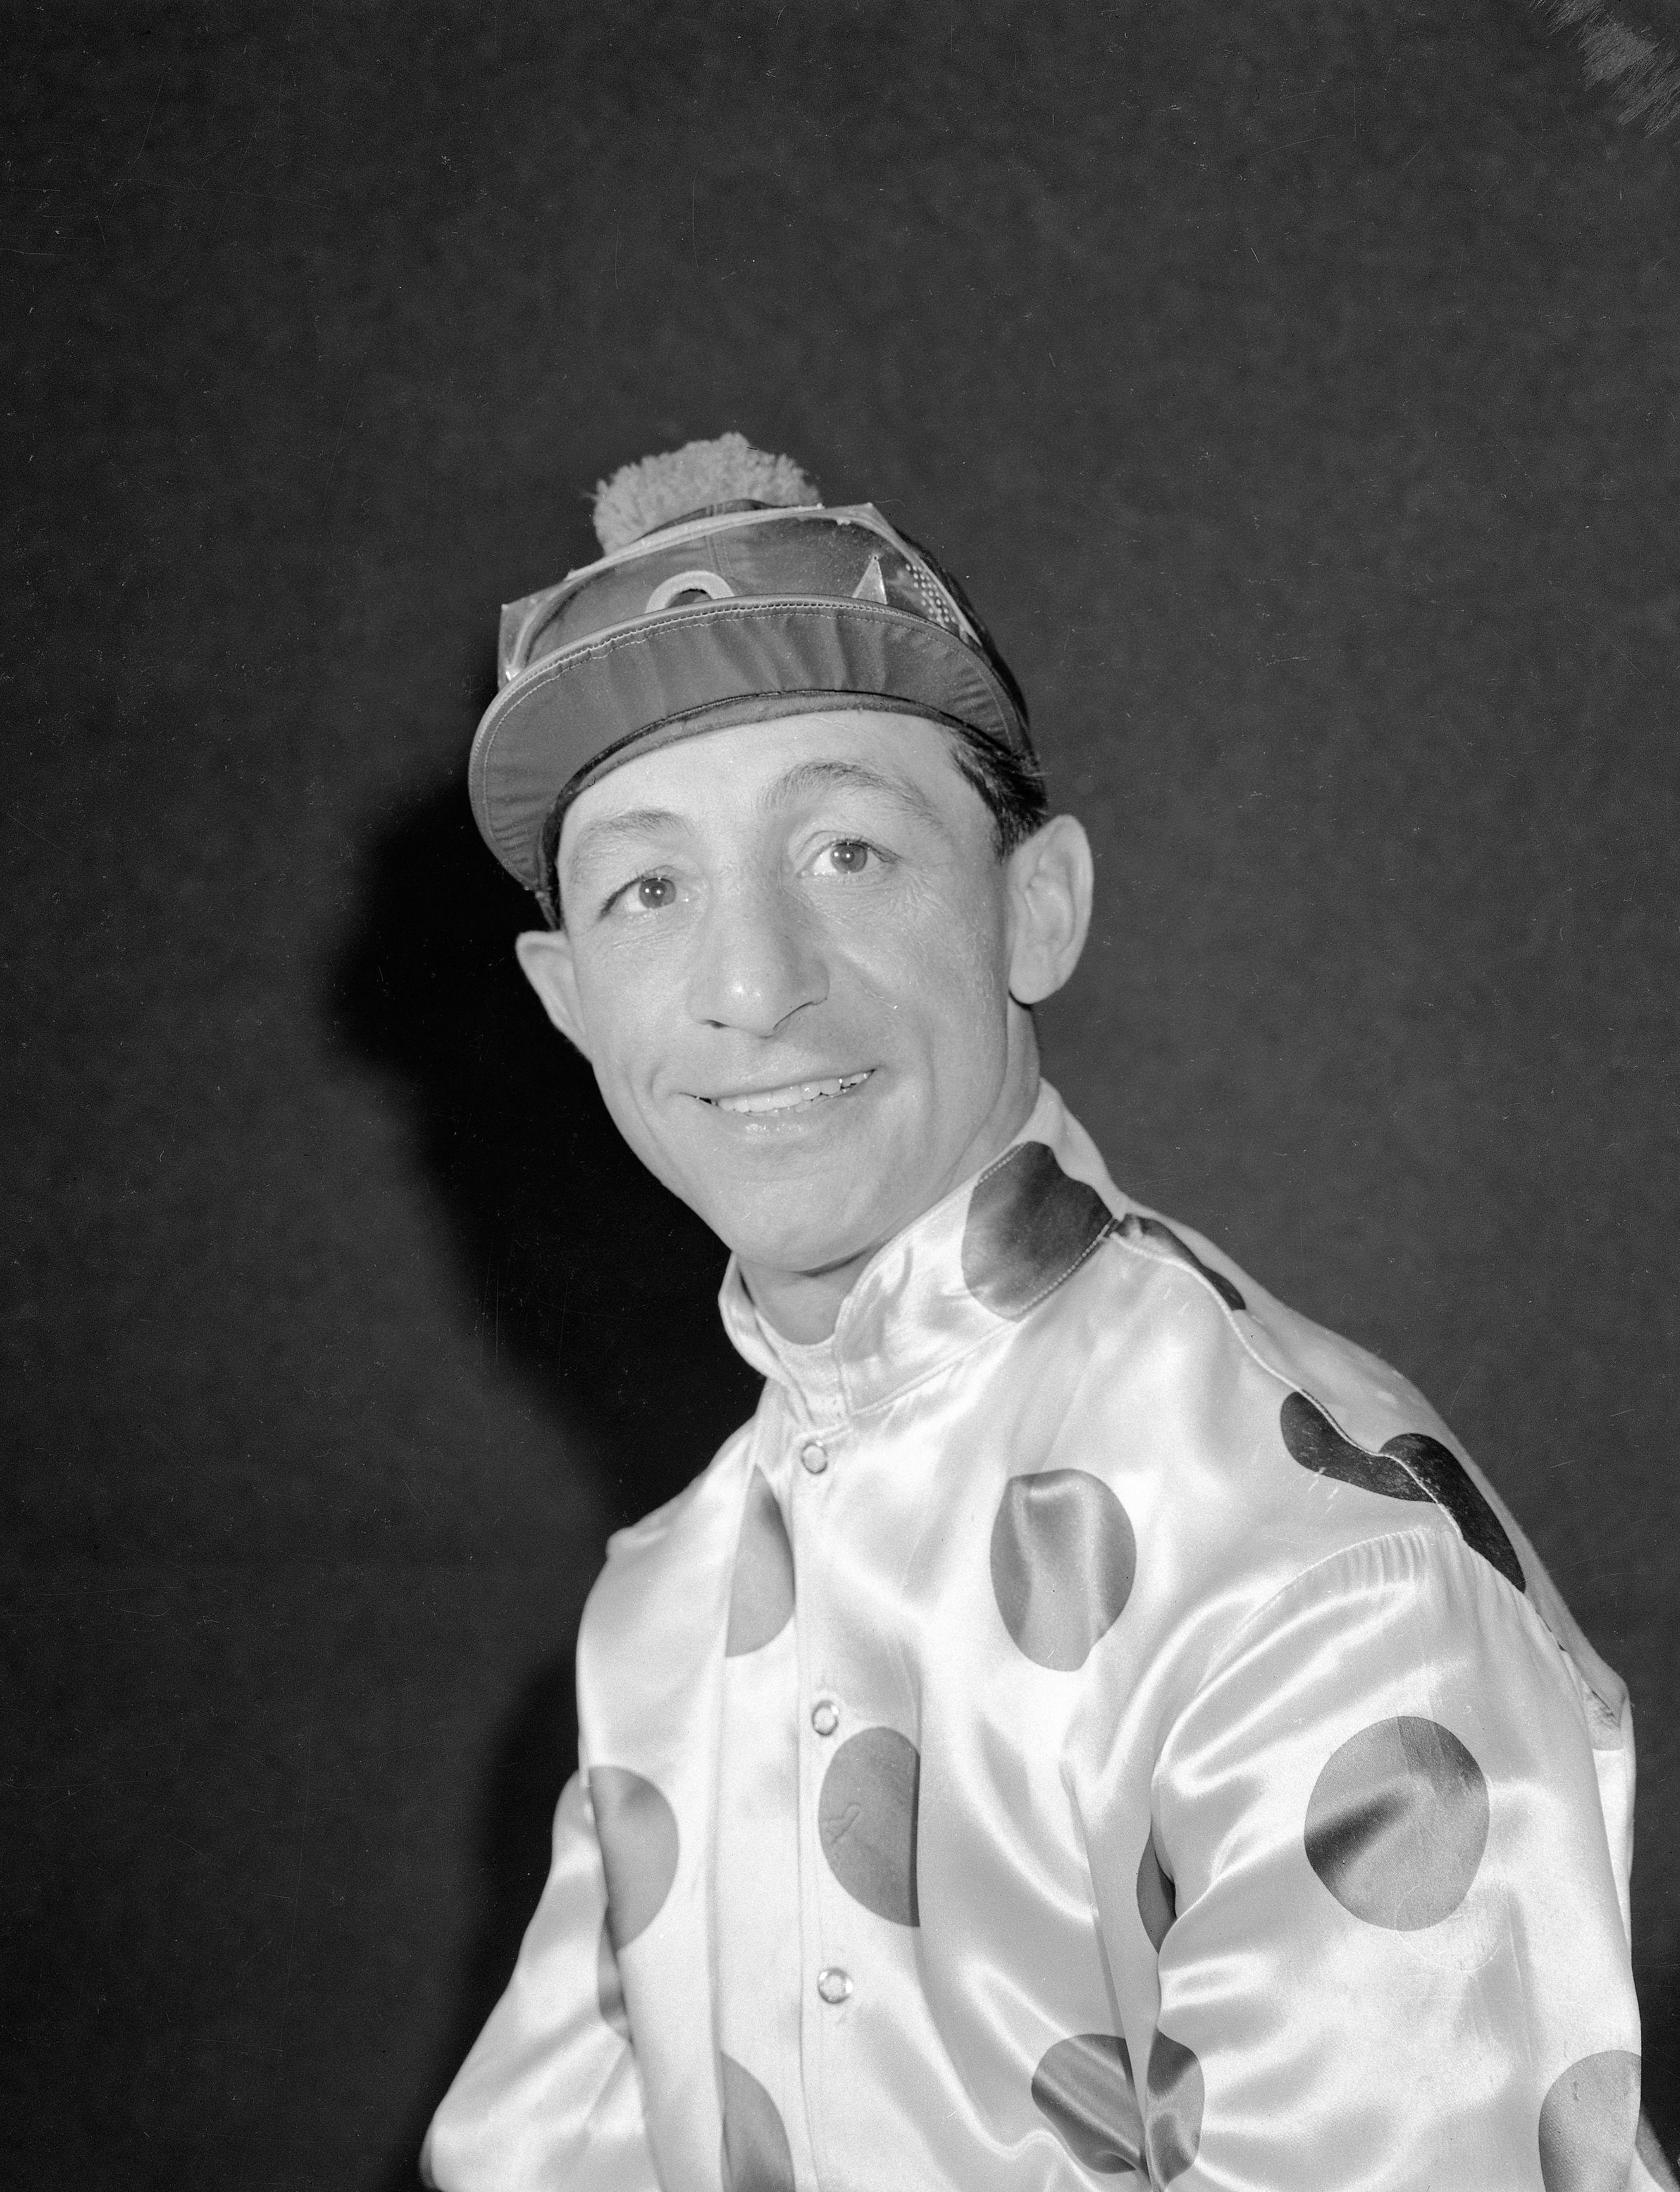 Eddie Arcaro (Keeneland Library Morgan Collection)